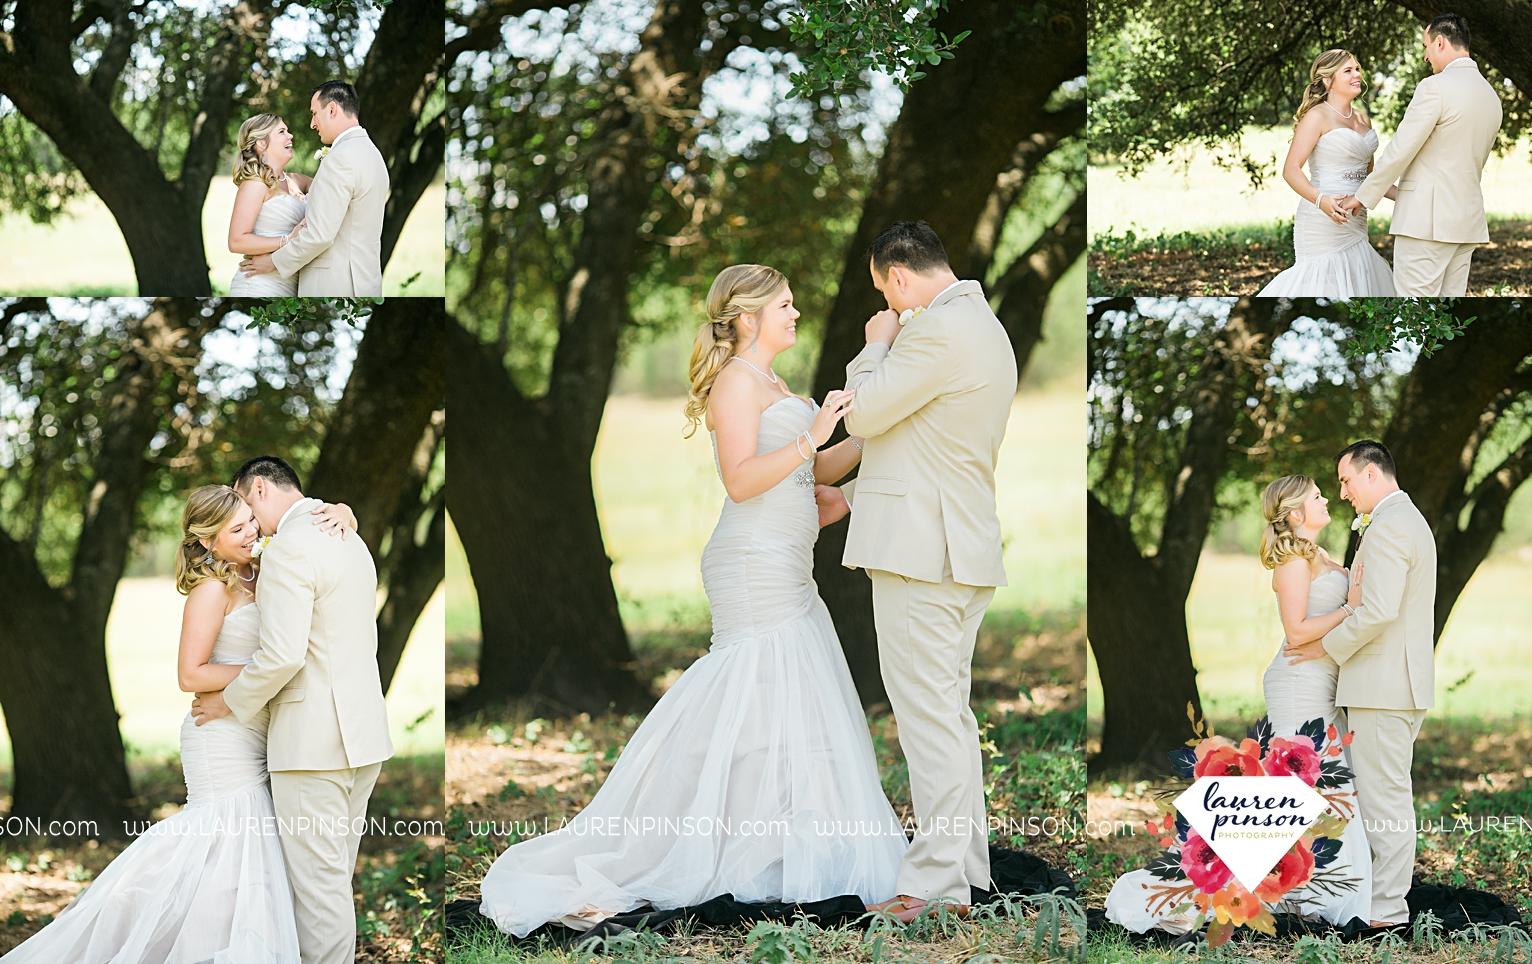 weatherford-texas-hollow-hill-farm-event-wedding-mineral-wells-dfw-wedding-photographer-wichita-falls-photography_3133.jpg